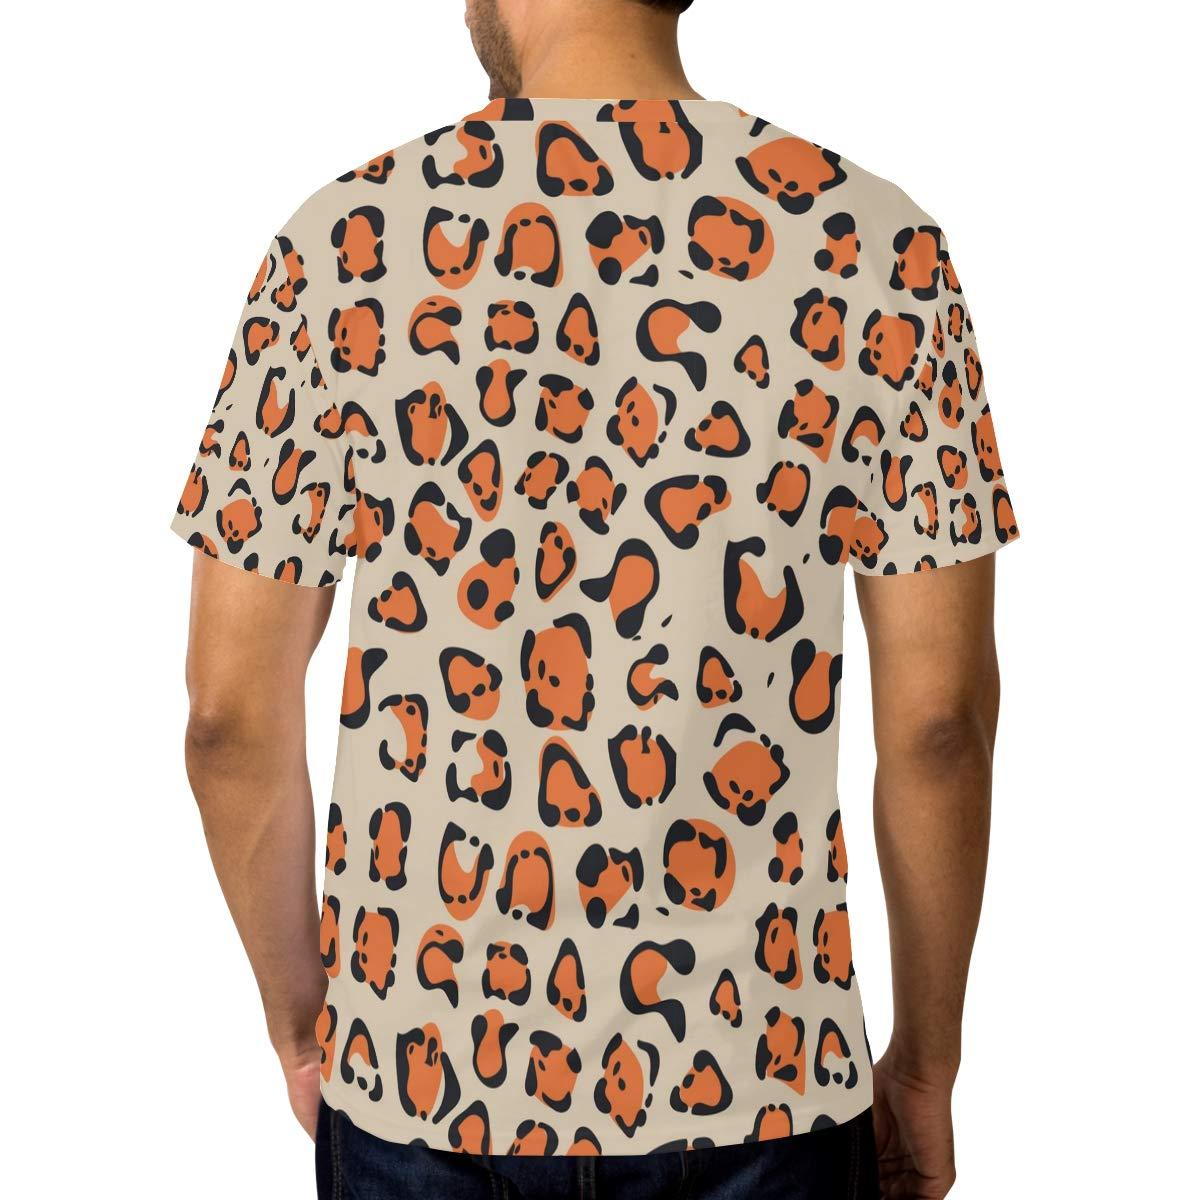 Horatiood Huberyyd Orange Leopard Print Decor Mens T Shirts Graphic Funny Body Print Short T-Shirt Unisex Pullover Blouse